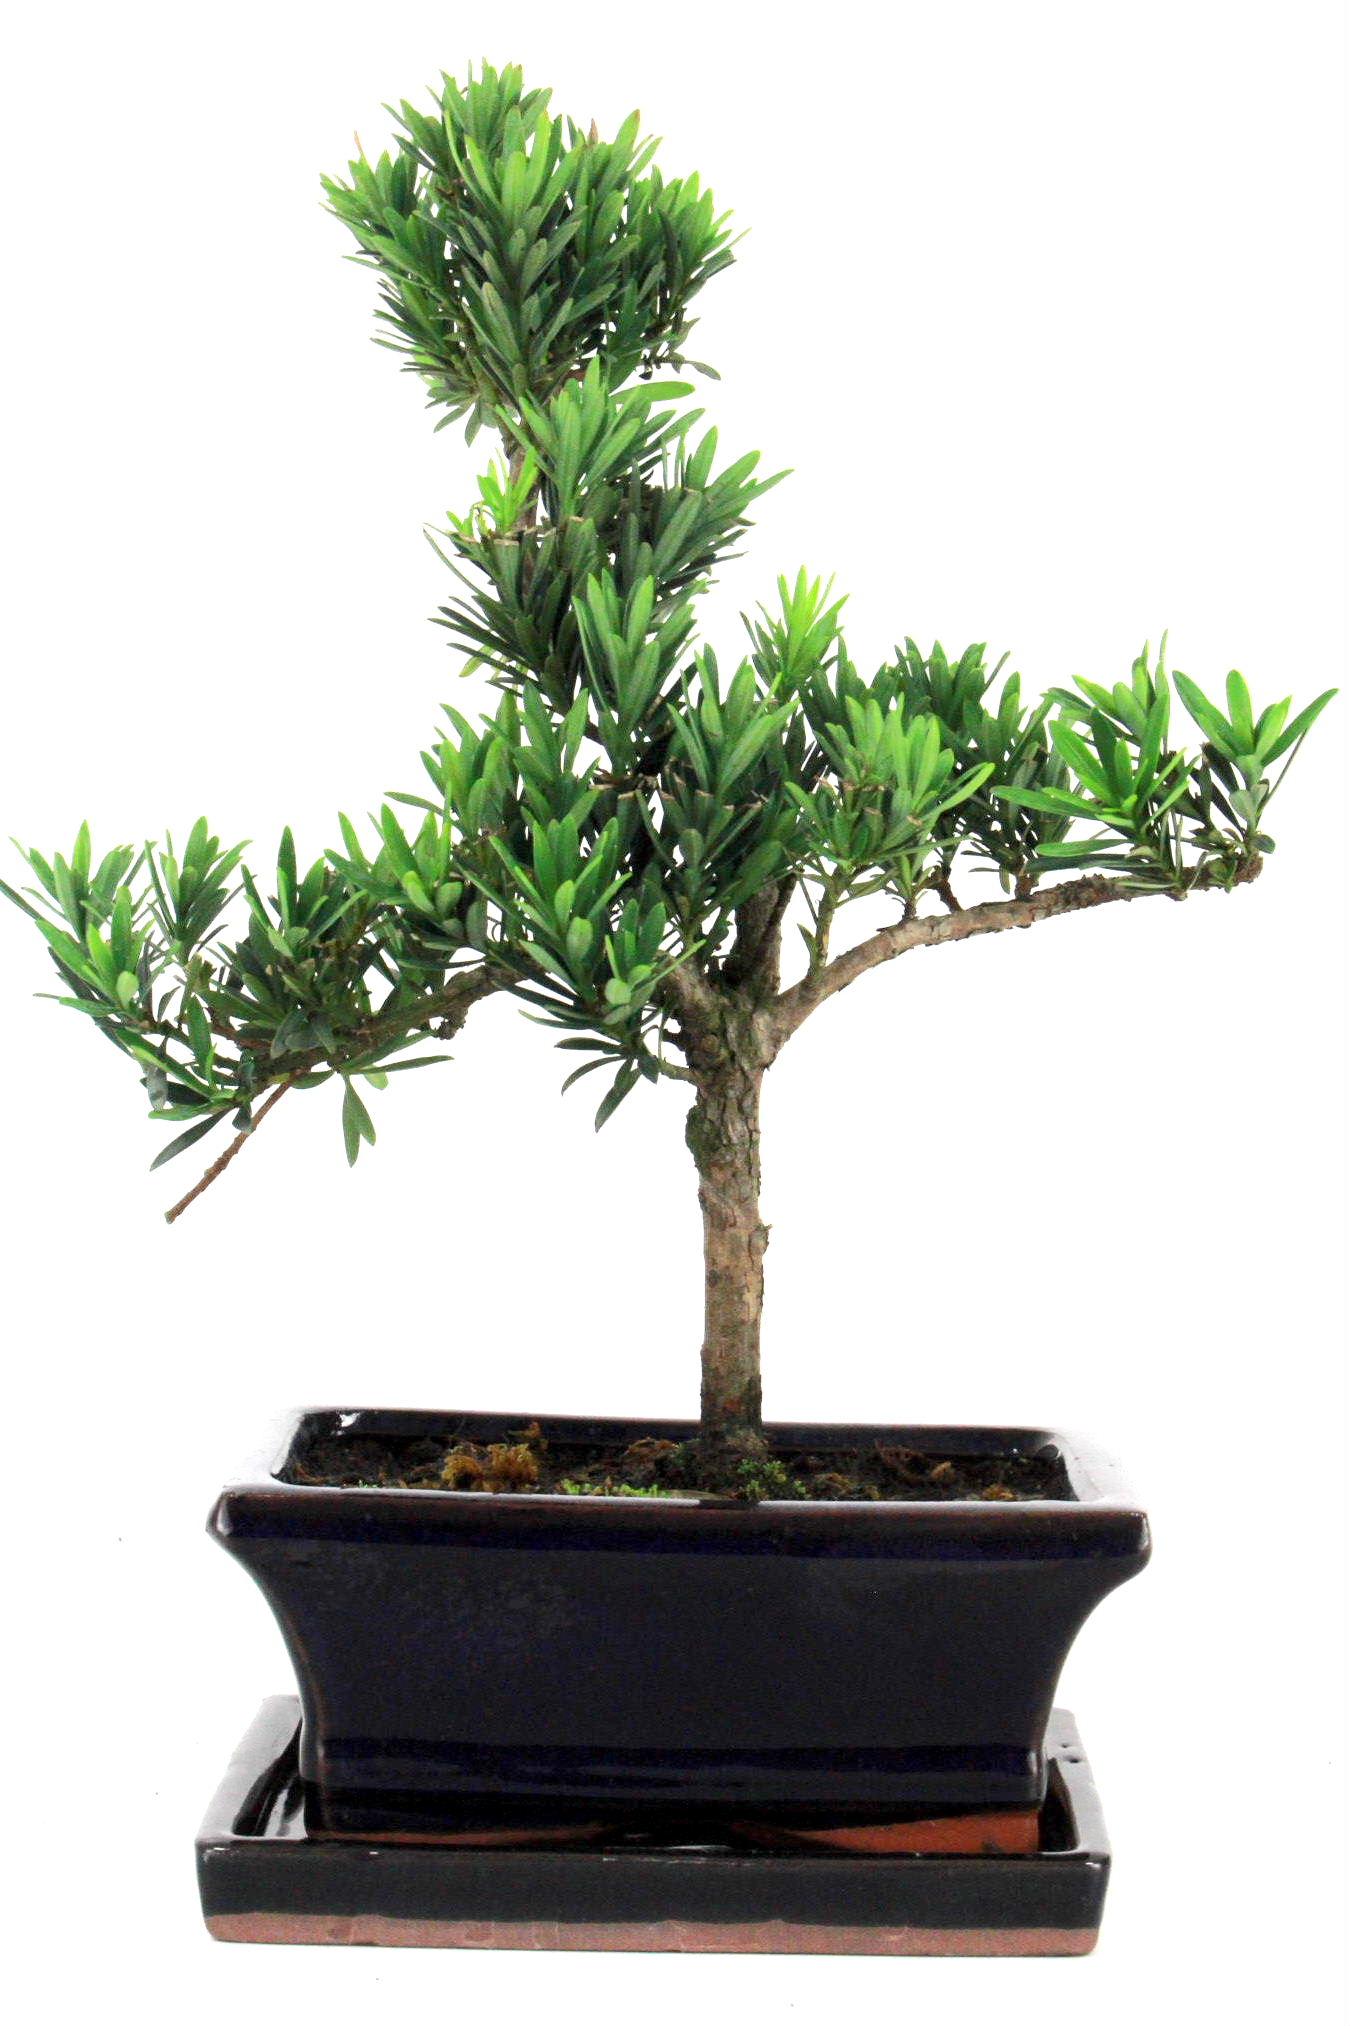 steineibe bonsai 30 35 cm 163 bei oyaki bonsai kaufen. Black Bedroom Furniture Sets. Home Design Ideas